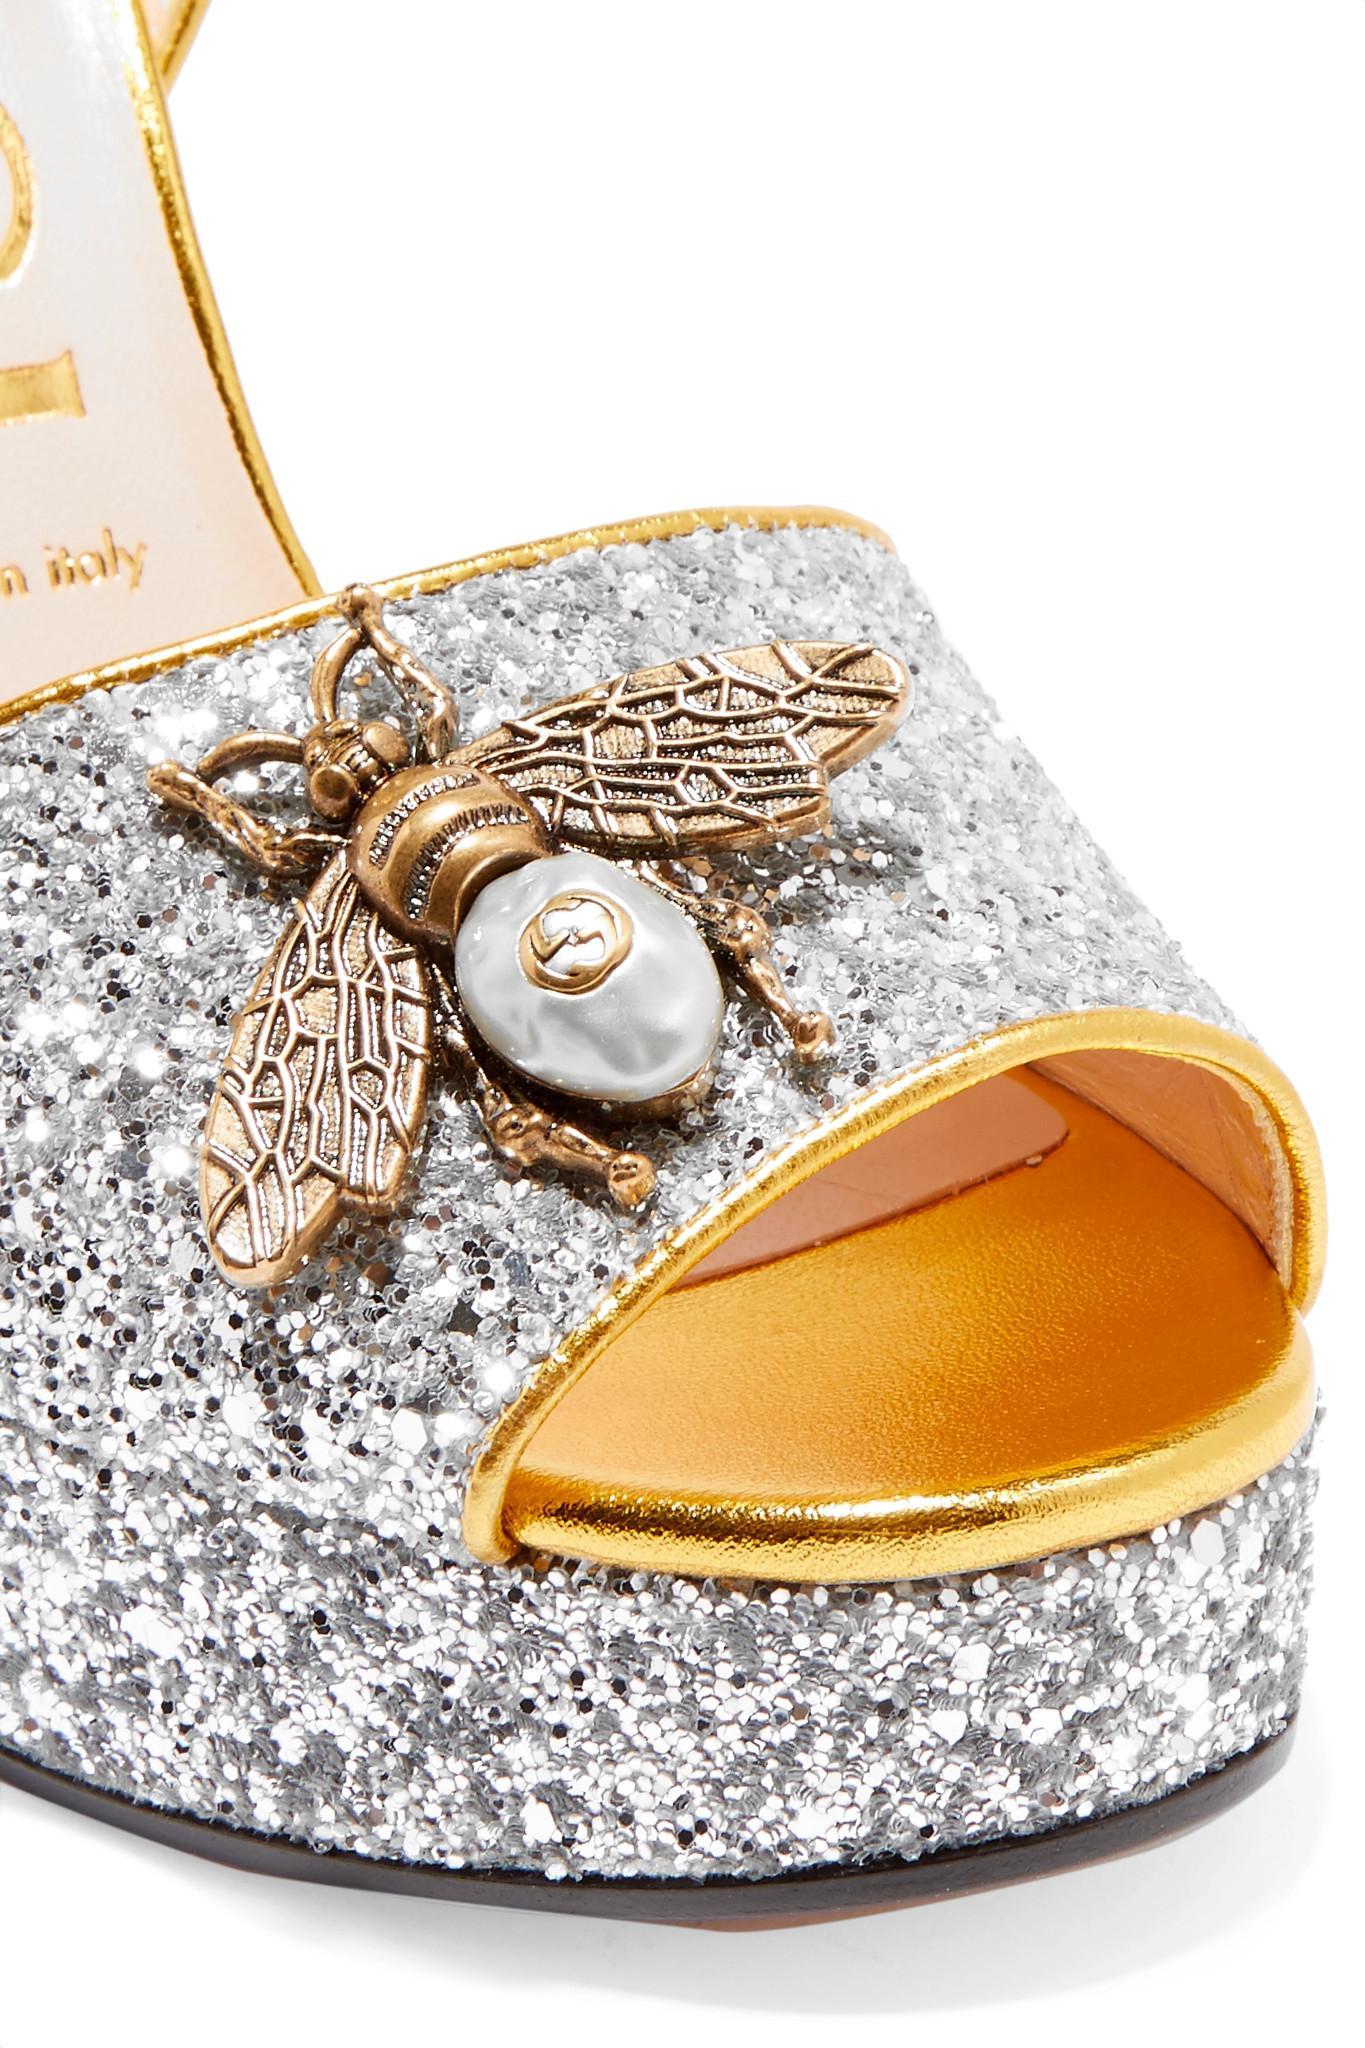 3e03256c8 Gucci Embellished Glittered Leather Platform Sandals in Metallic - Lyst